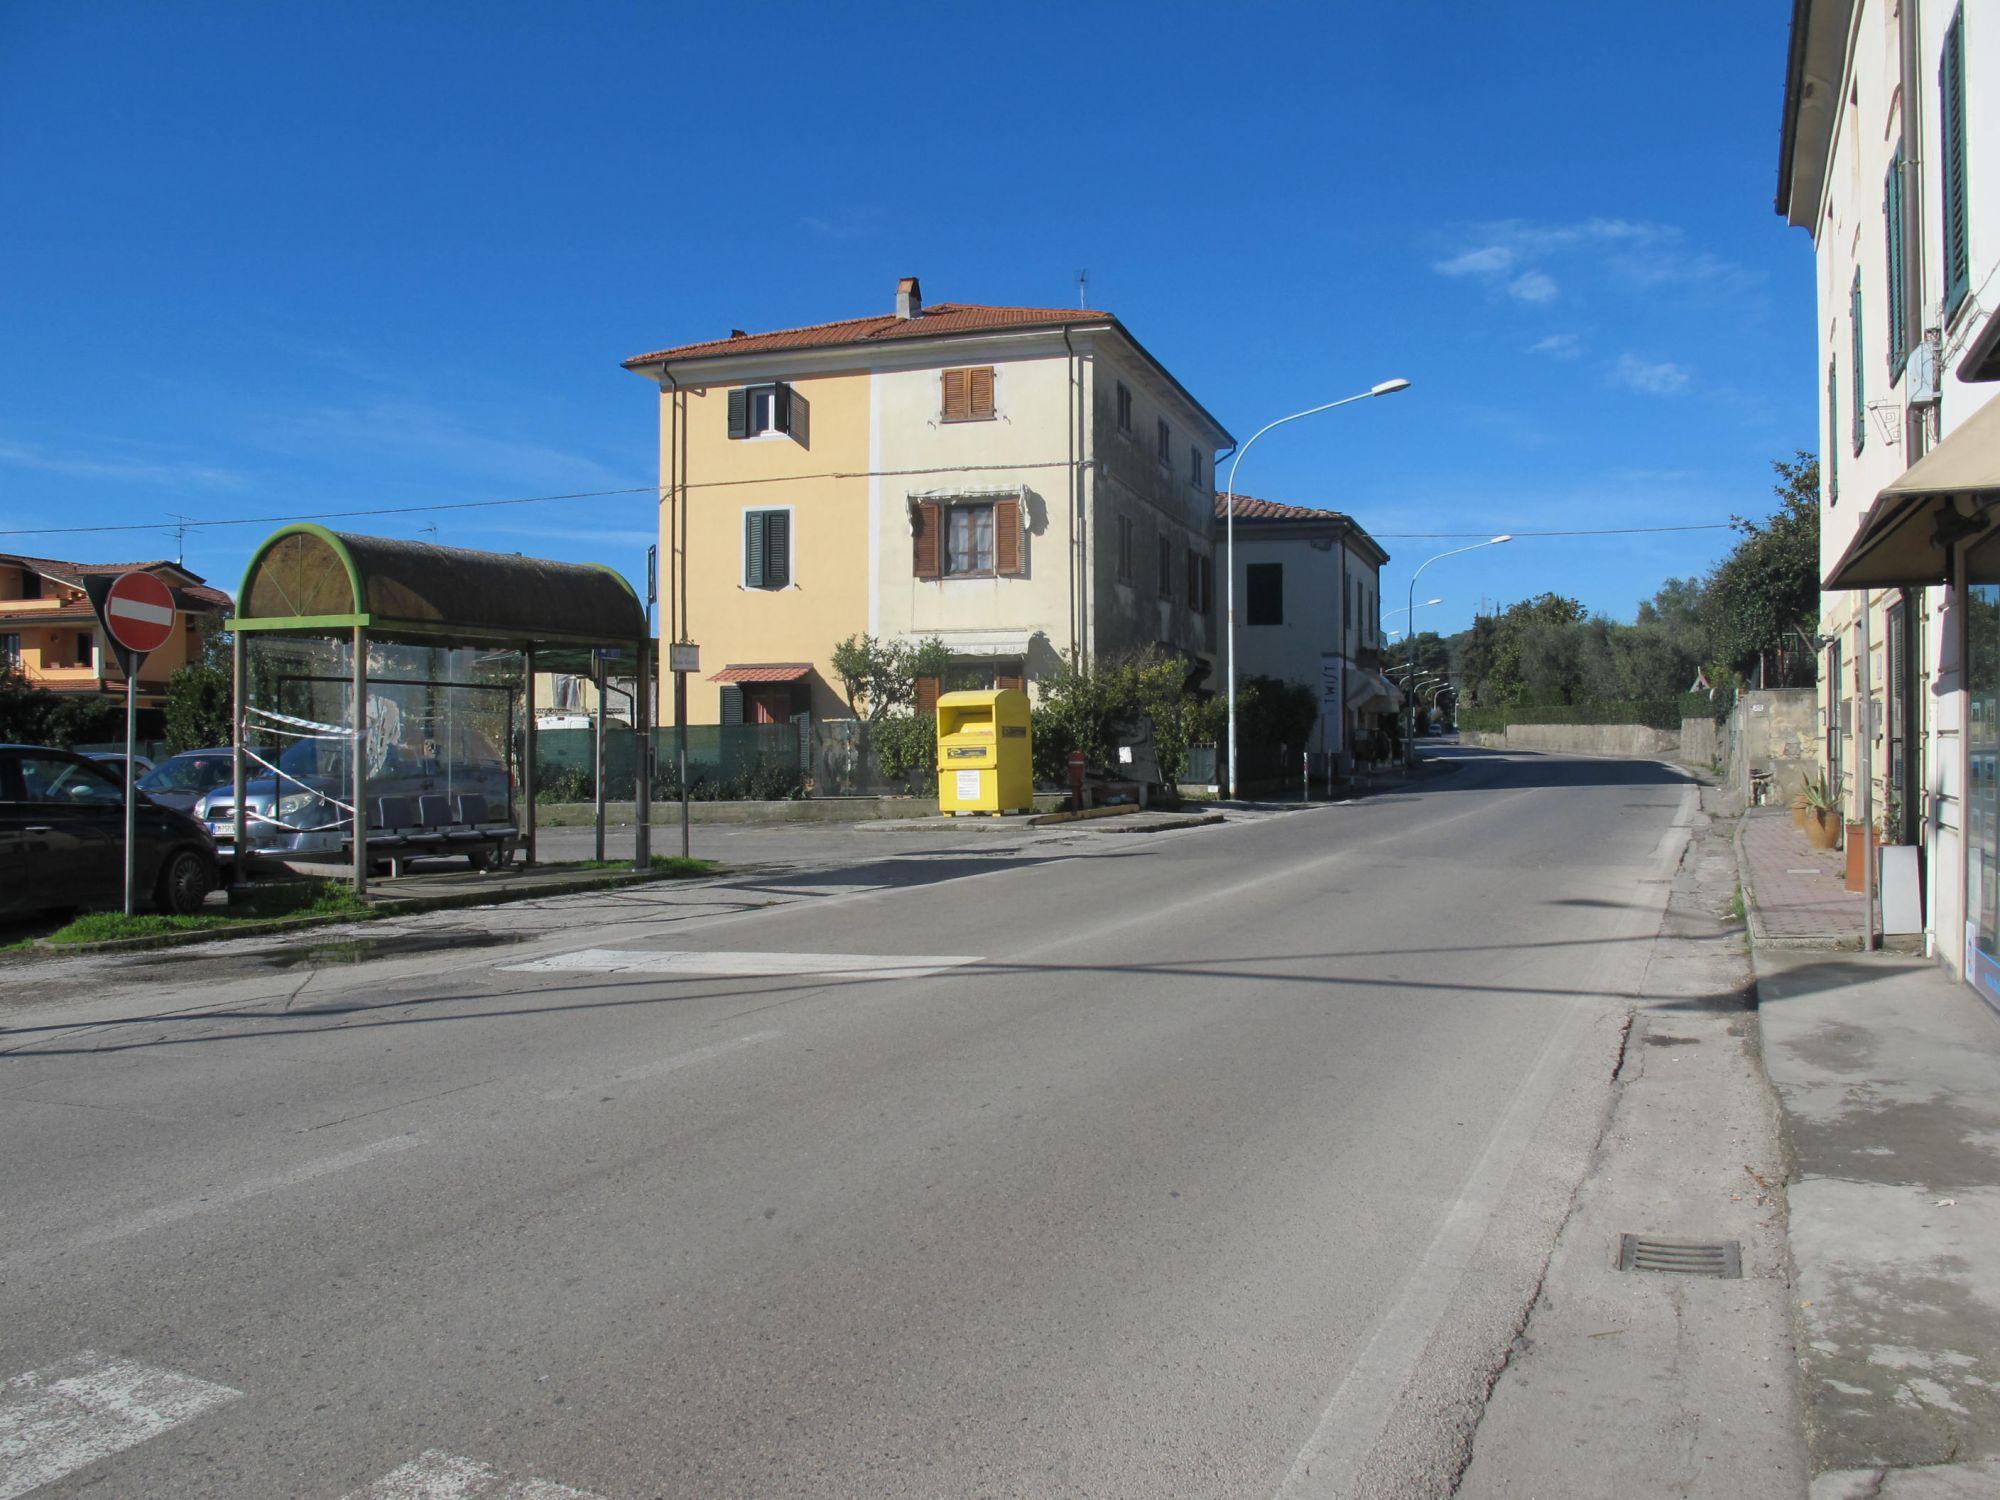 Passi carrabili a Massarosa, proroga al 30 novembre